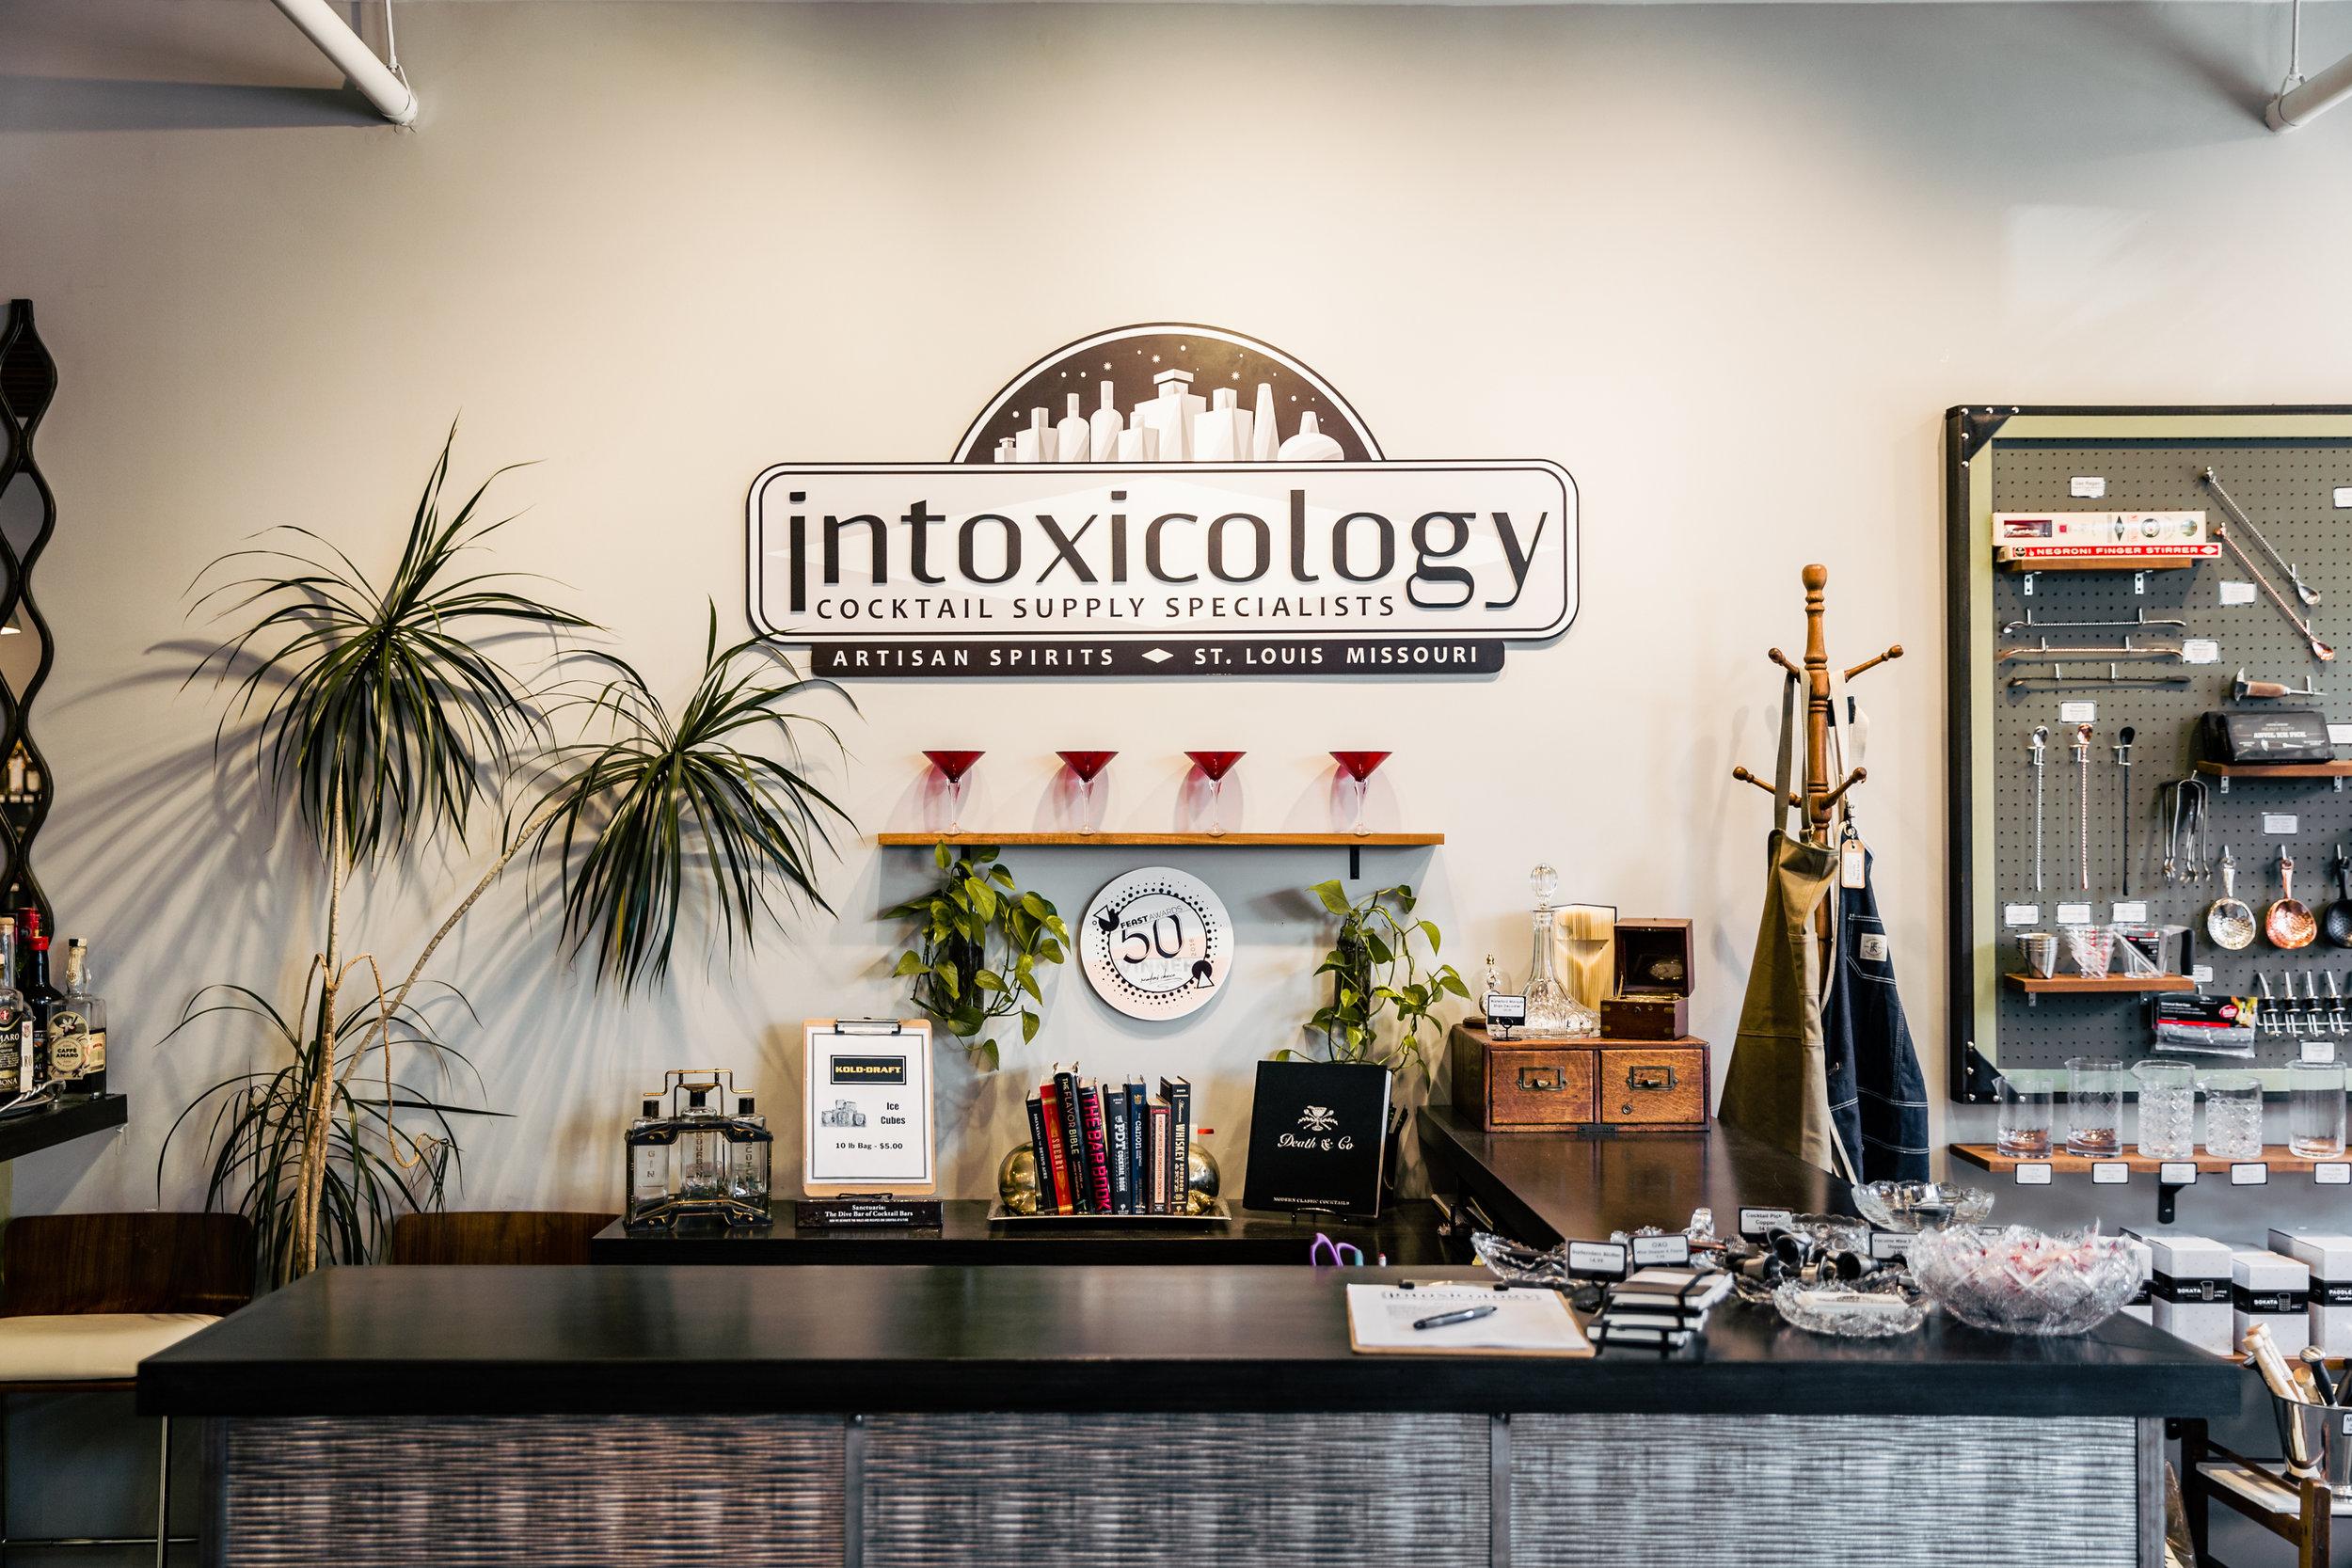 Trinh_IntoxicologySpace_August2018_008.jpg